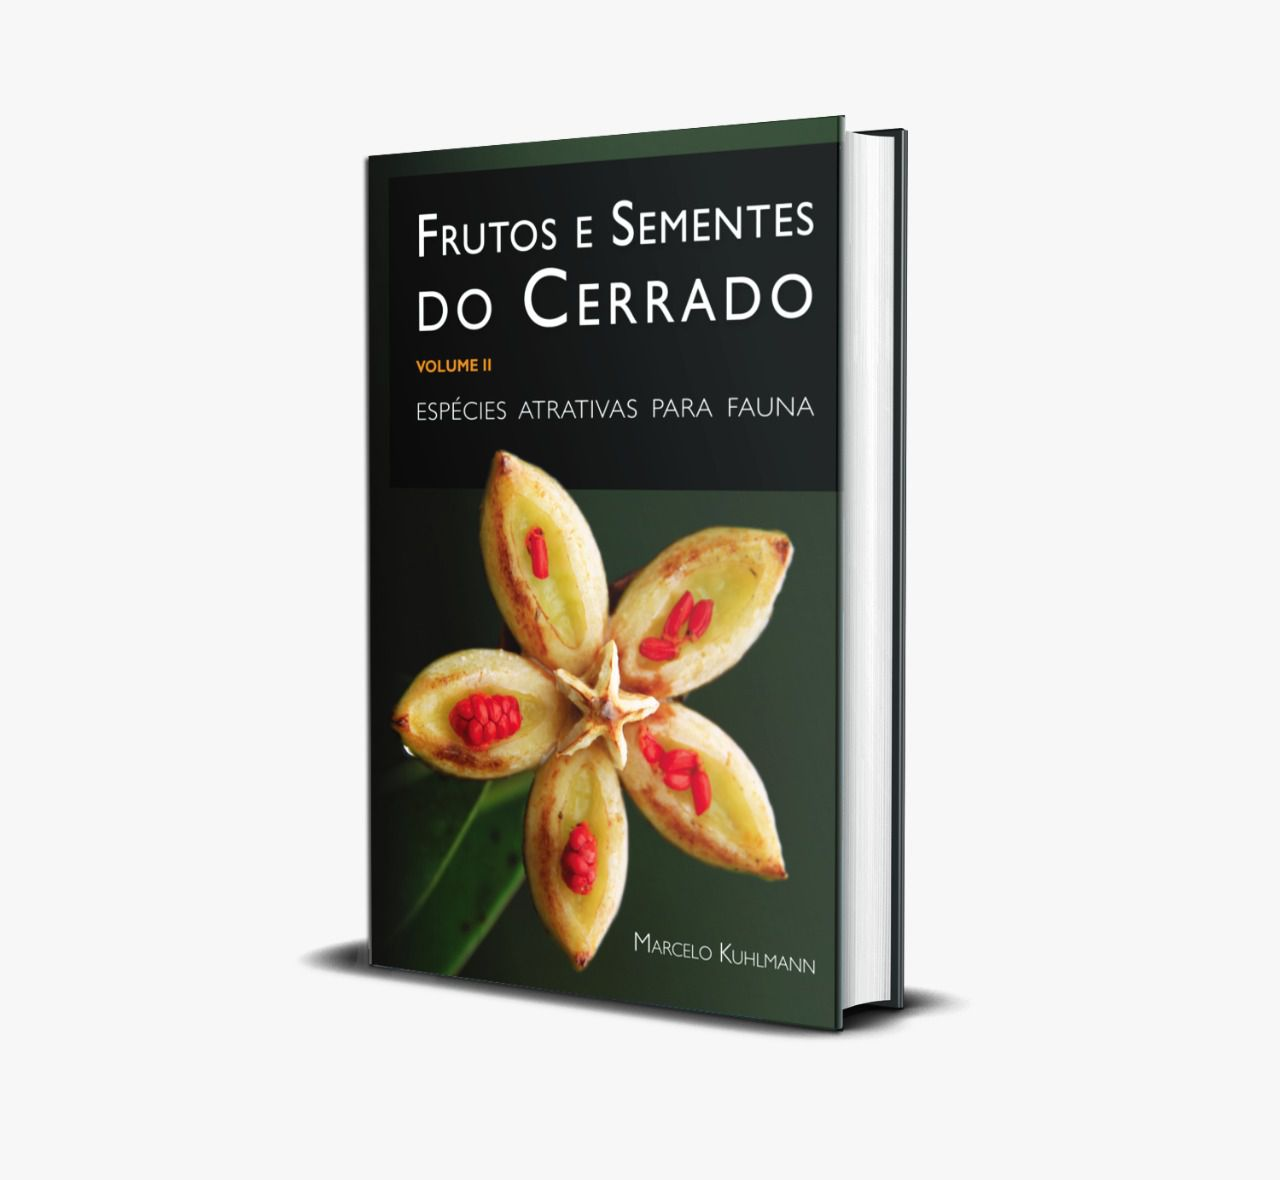 FRUTOS E SEMENTES DO CERRADO - VOLUME II